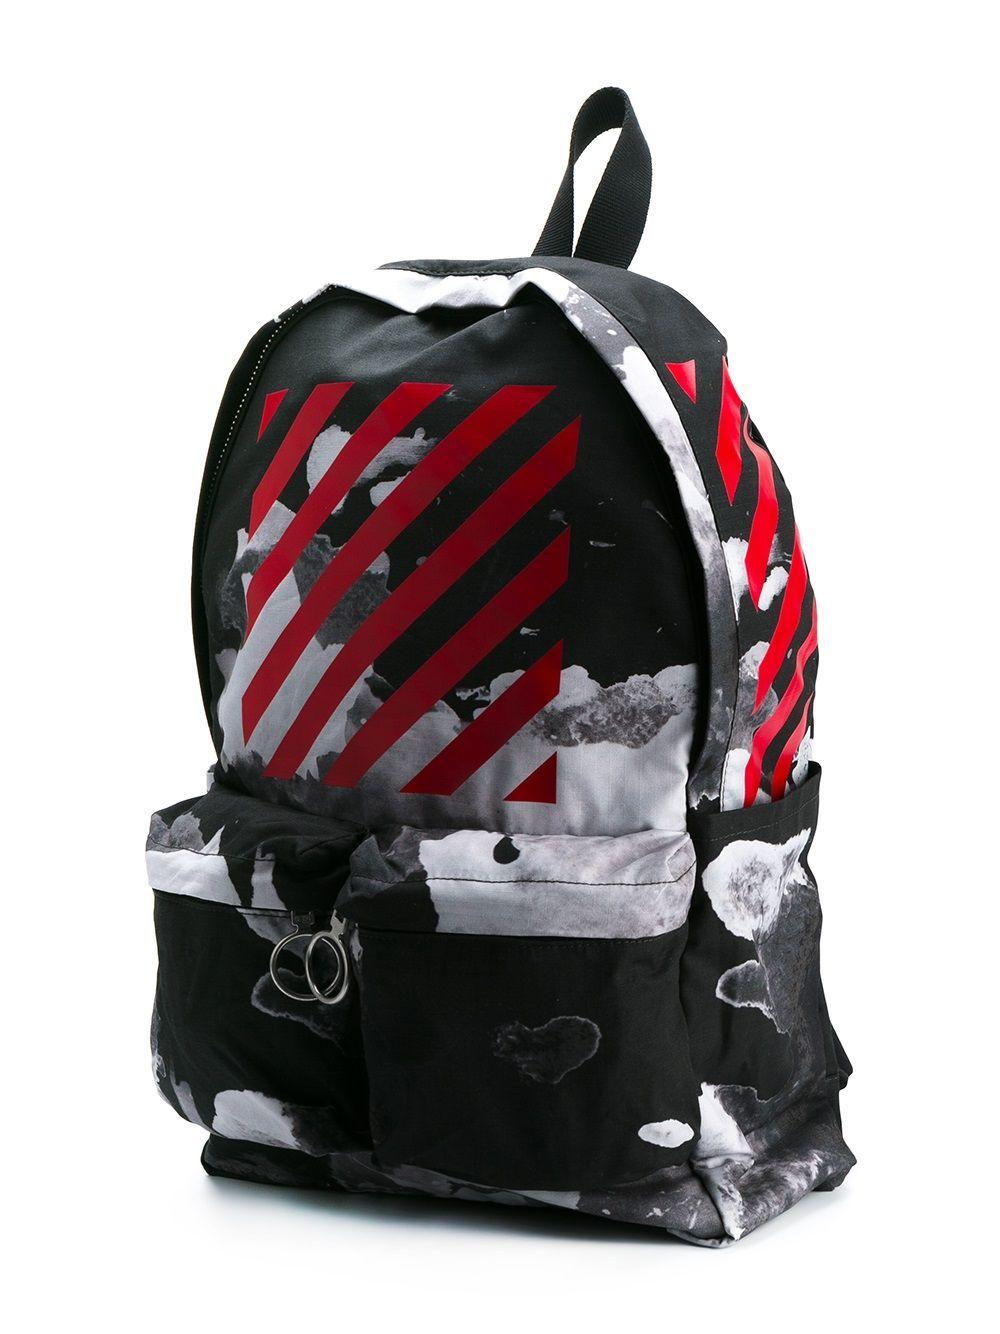 9bc53dbf20ae Off-White рюкзак с абстрактным принтом | backpacks style in 2019 ...